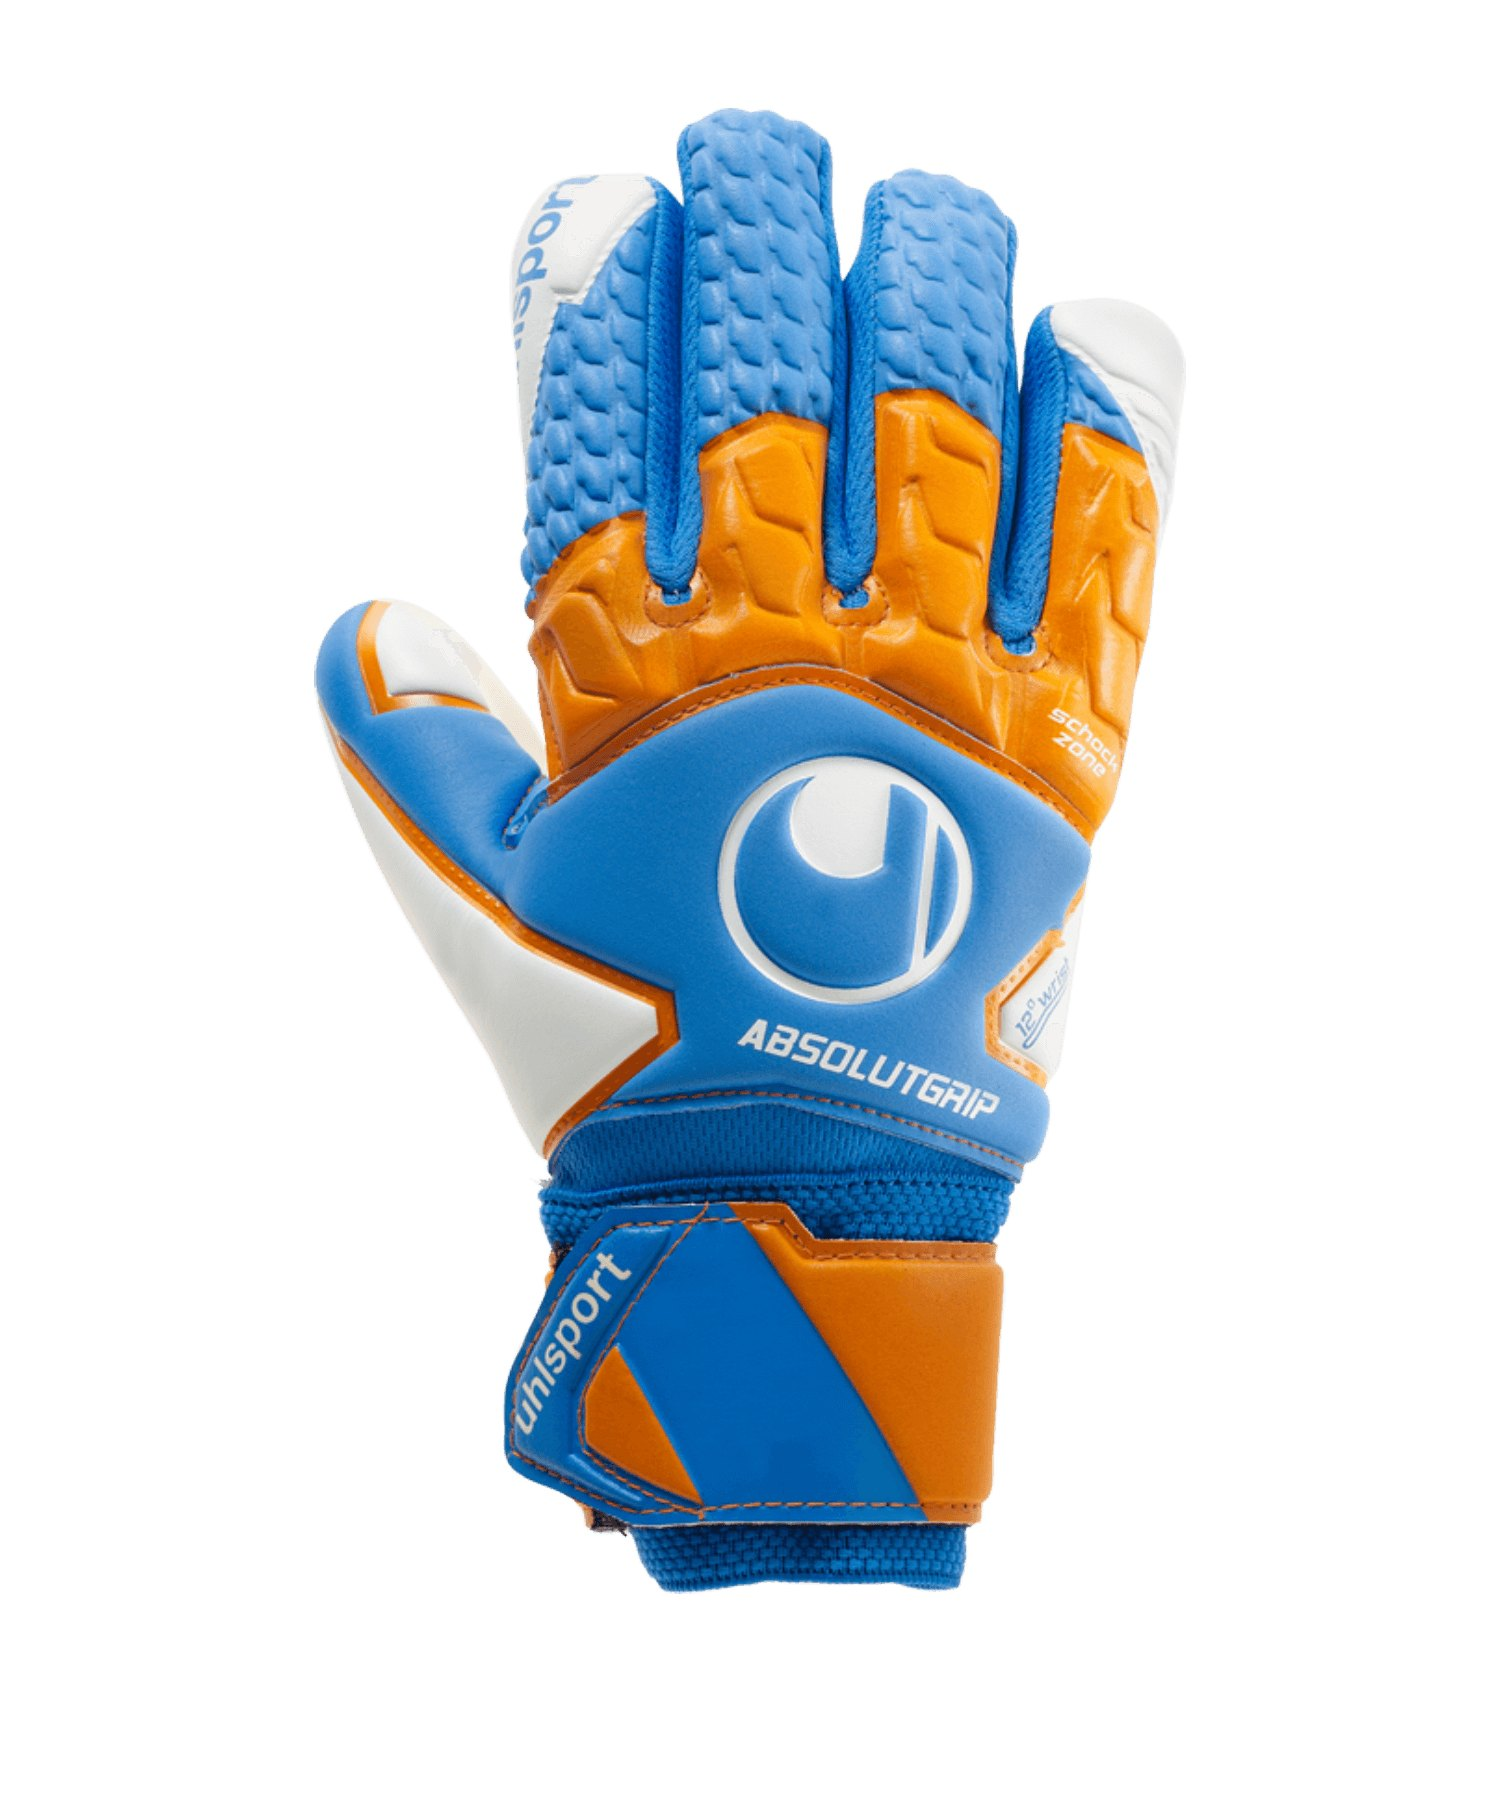 Uhlsport Absolutgrip HN Pro TW-Handschuh Kids F01 - blau